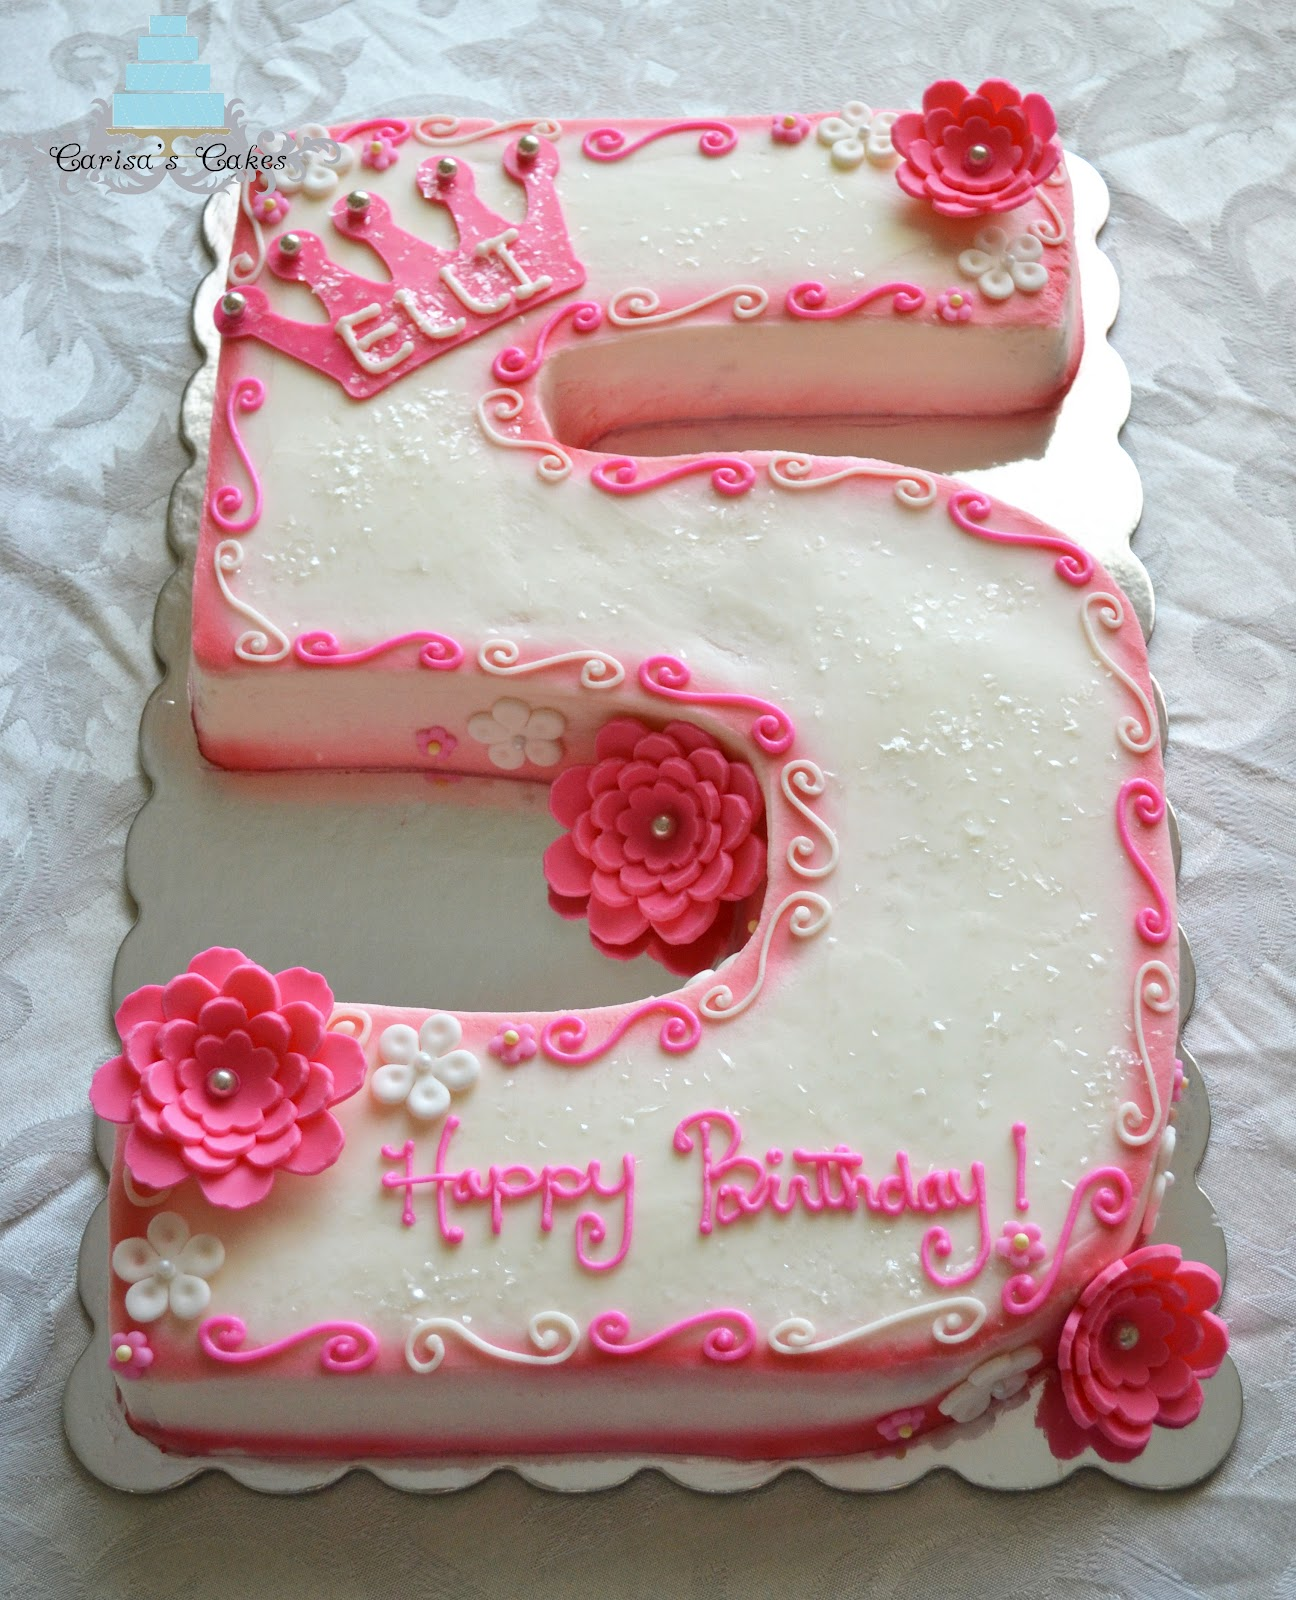 Carisa S Cakes 5 Shaped Birthday Cake